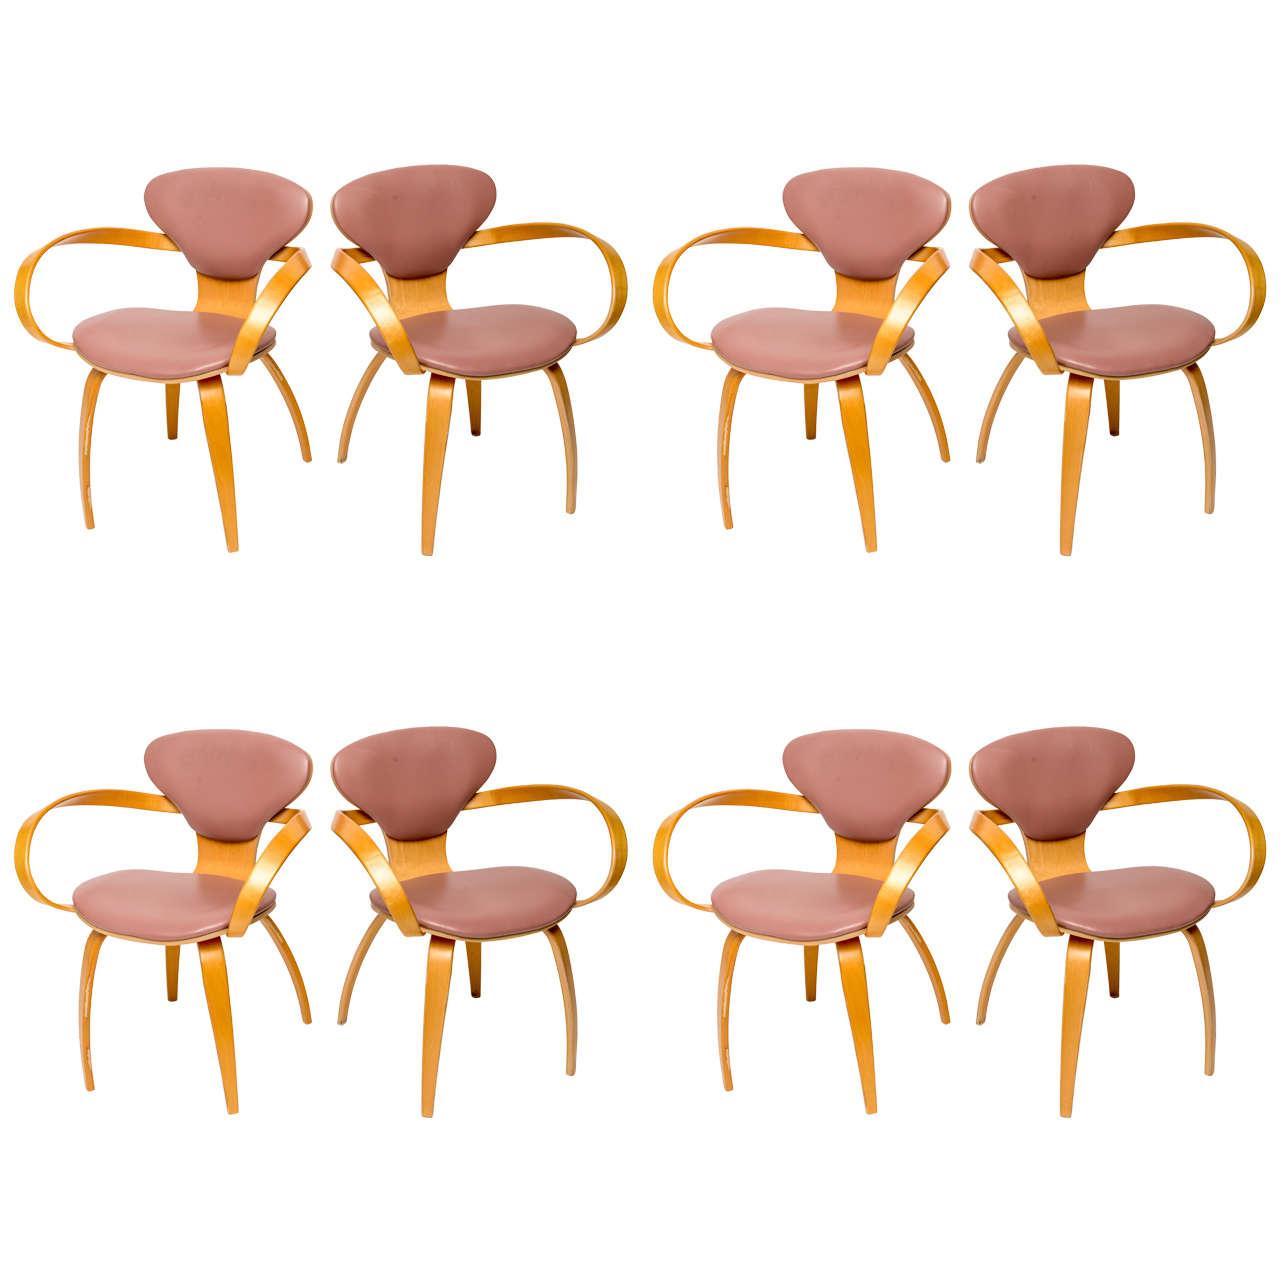 Normal Cherner Pretzel Chairs for Plycraft 1